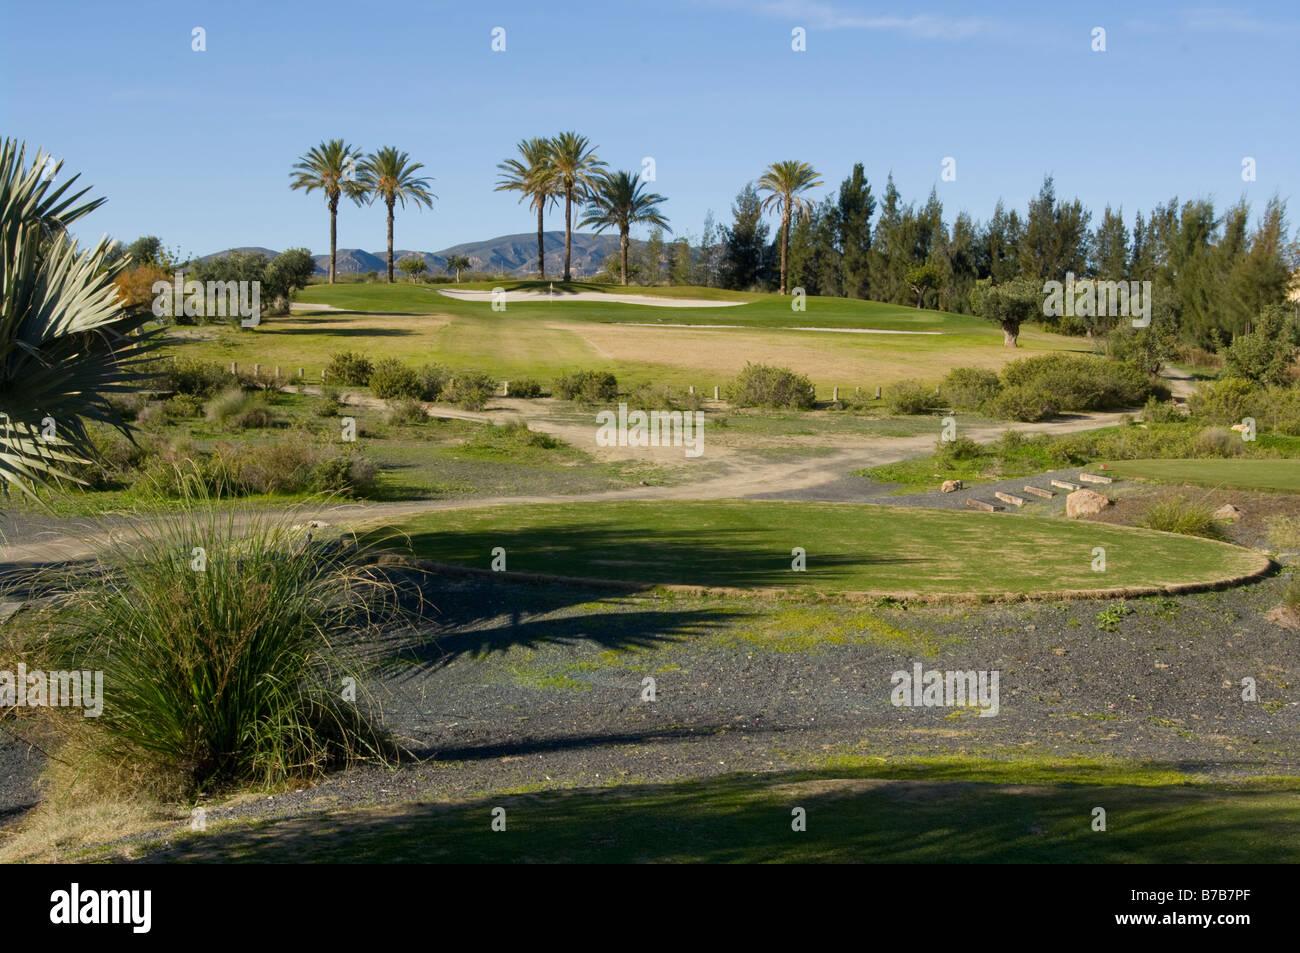 'Par 3' '4th Hole' Valle Del Este Golf Course Resort Vera Almeria Spain Spanish Golf Courses - Stock Image